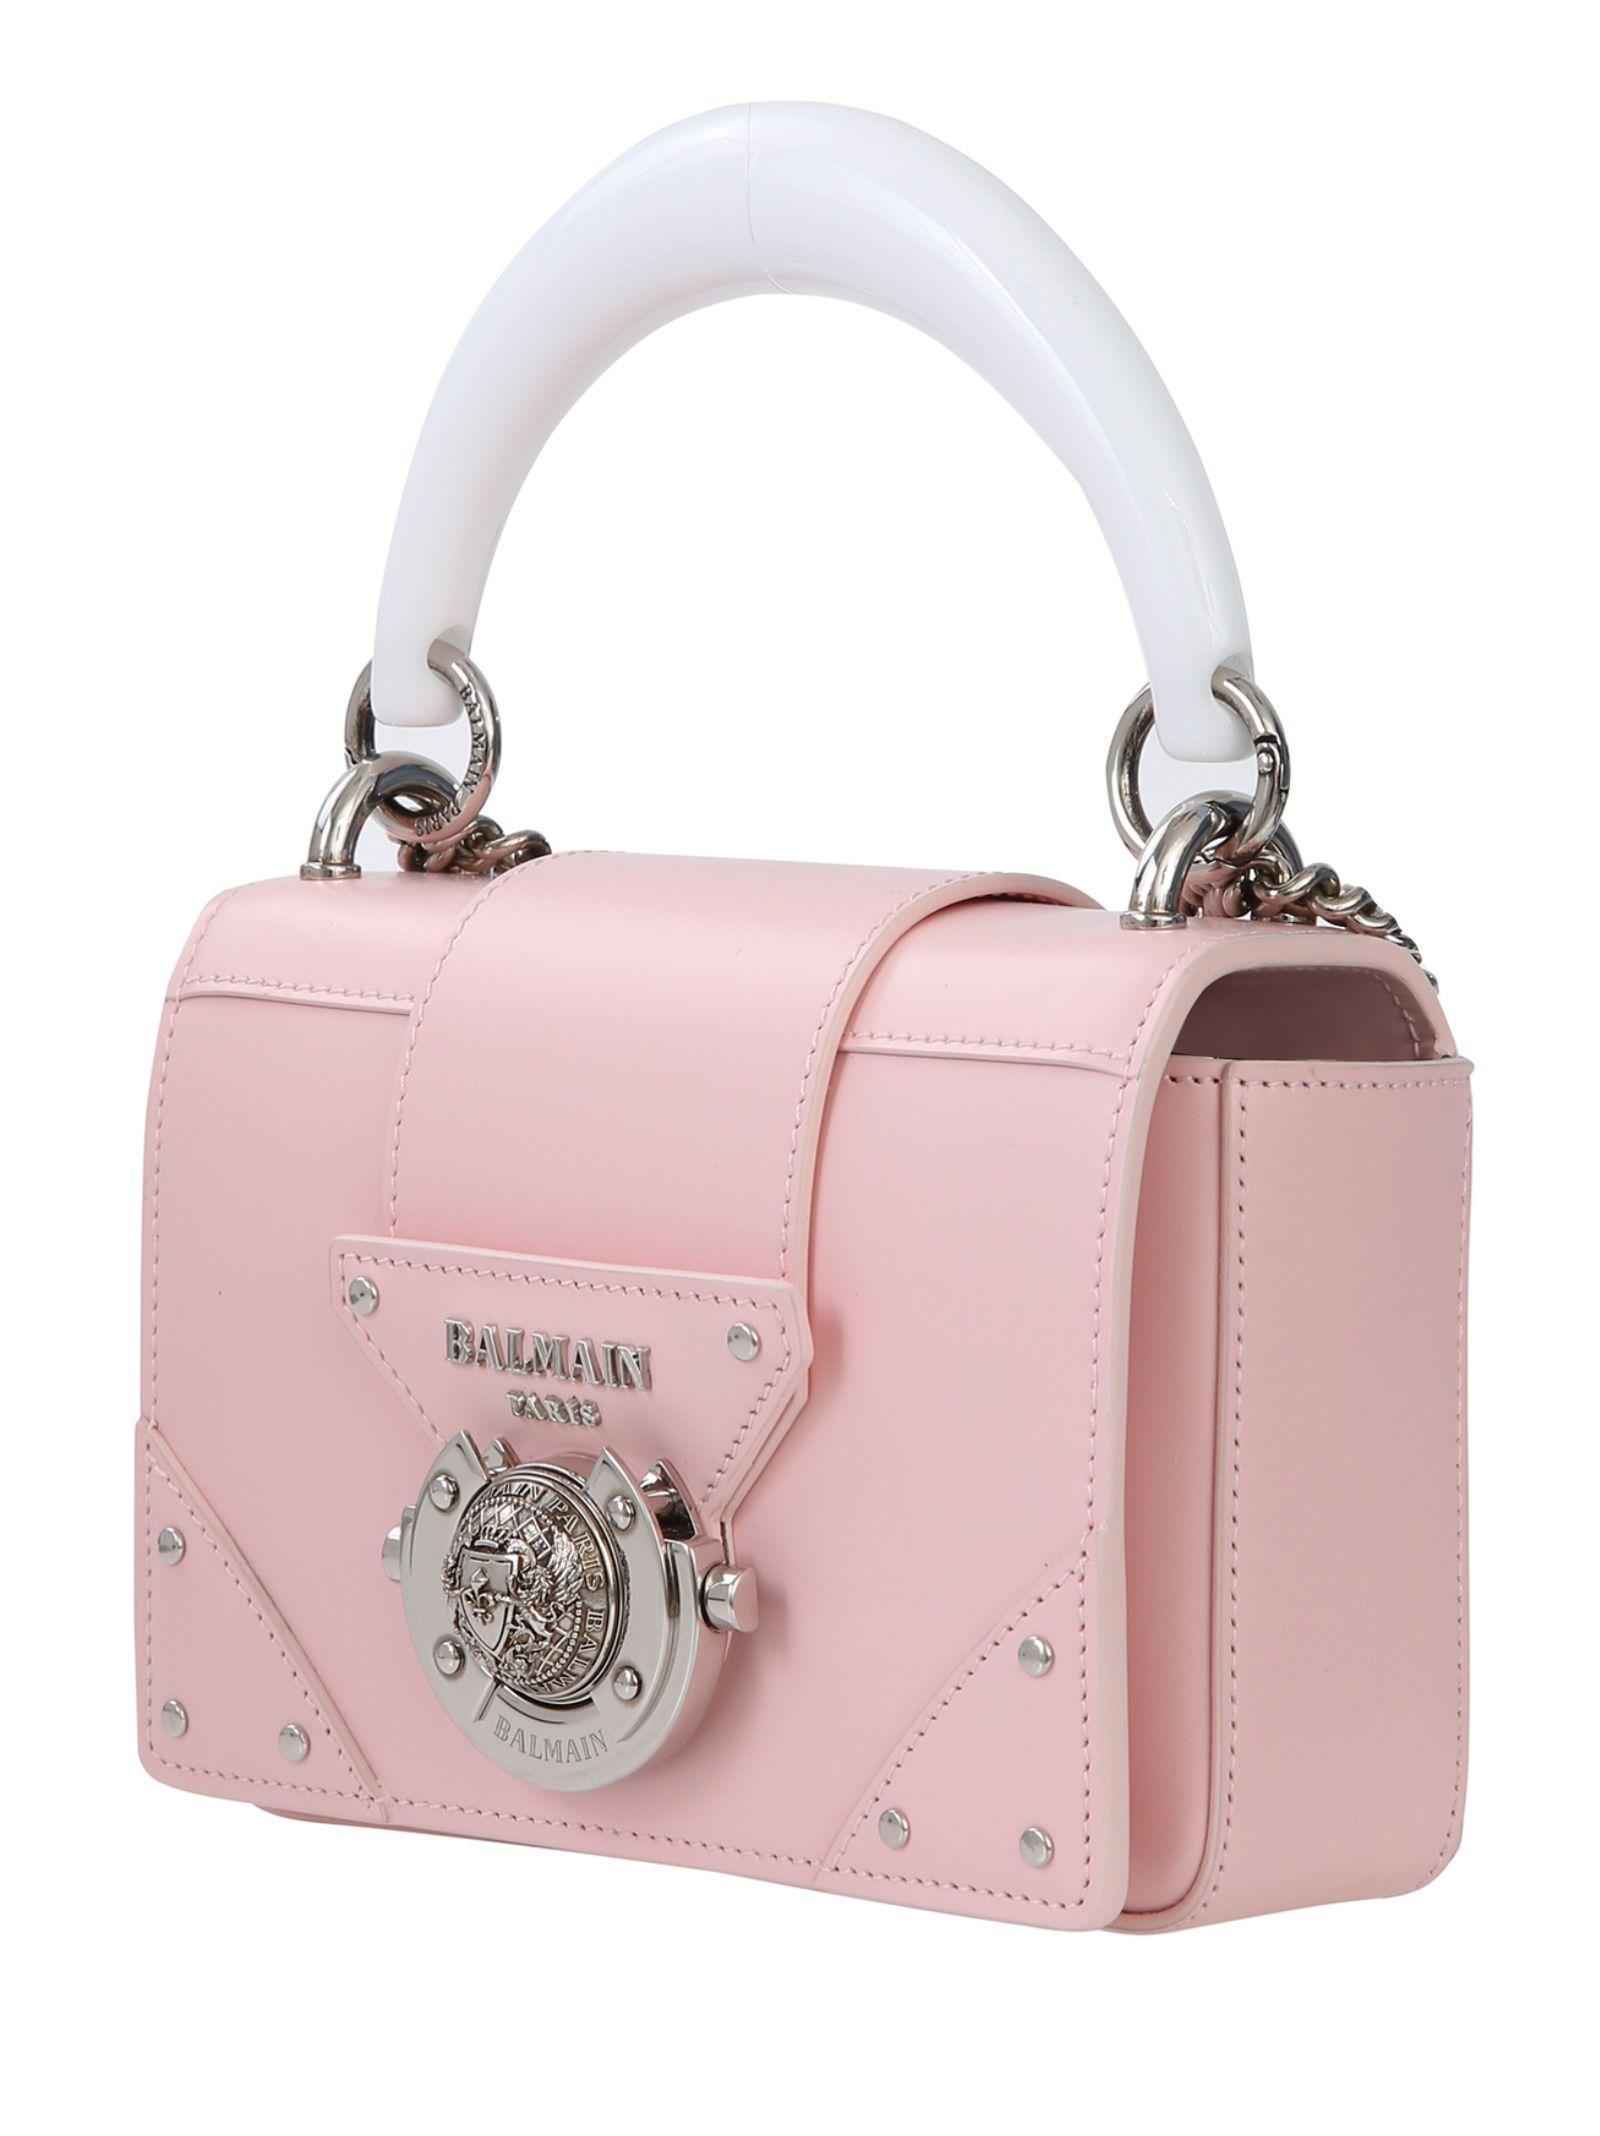 1043abb04e8 Balmain Balmain Paris Shoulder Bag - Pink - 10935144 | italist